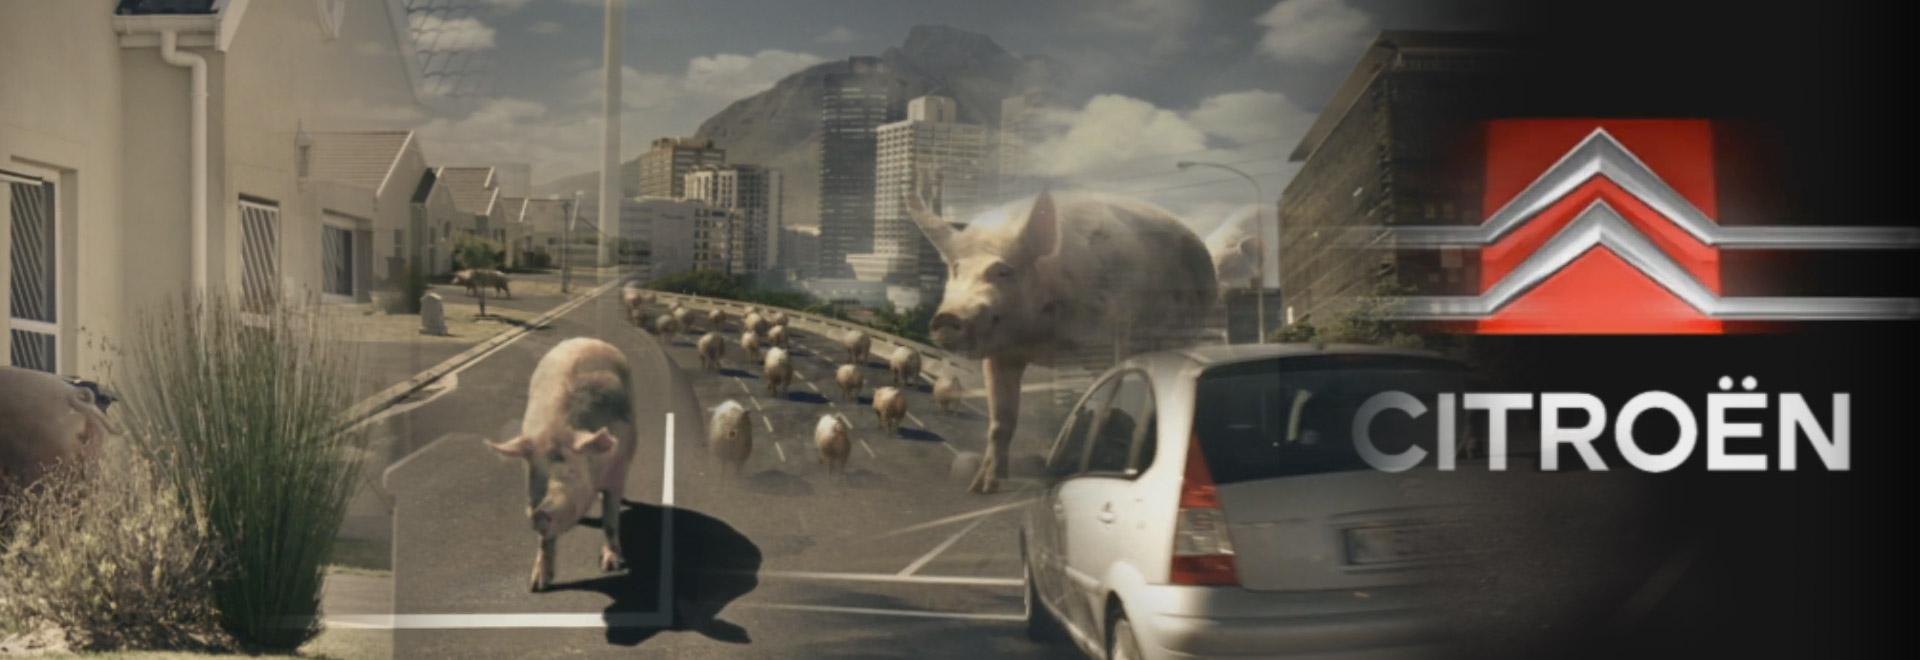 js-filmproduction-postproduction-commercial-citroen-dieselschweine-header